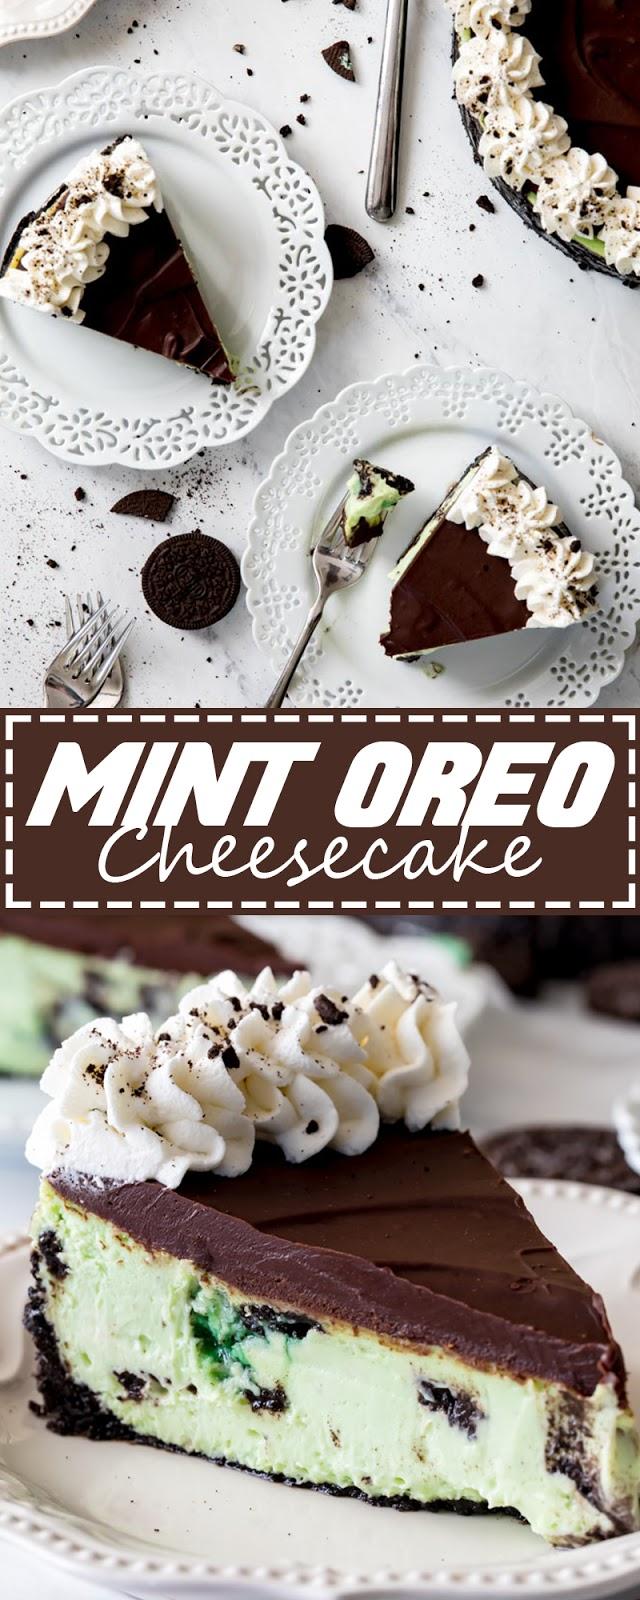 MINT OREO CHEESECAKE